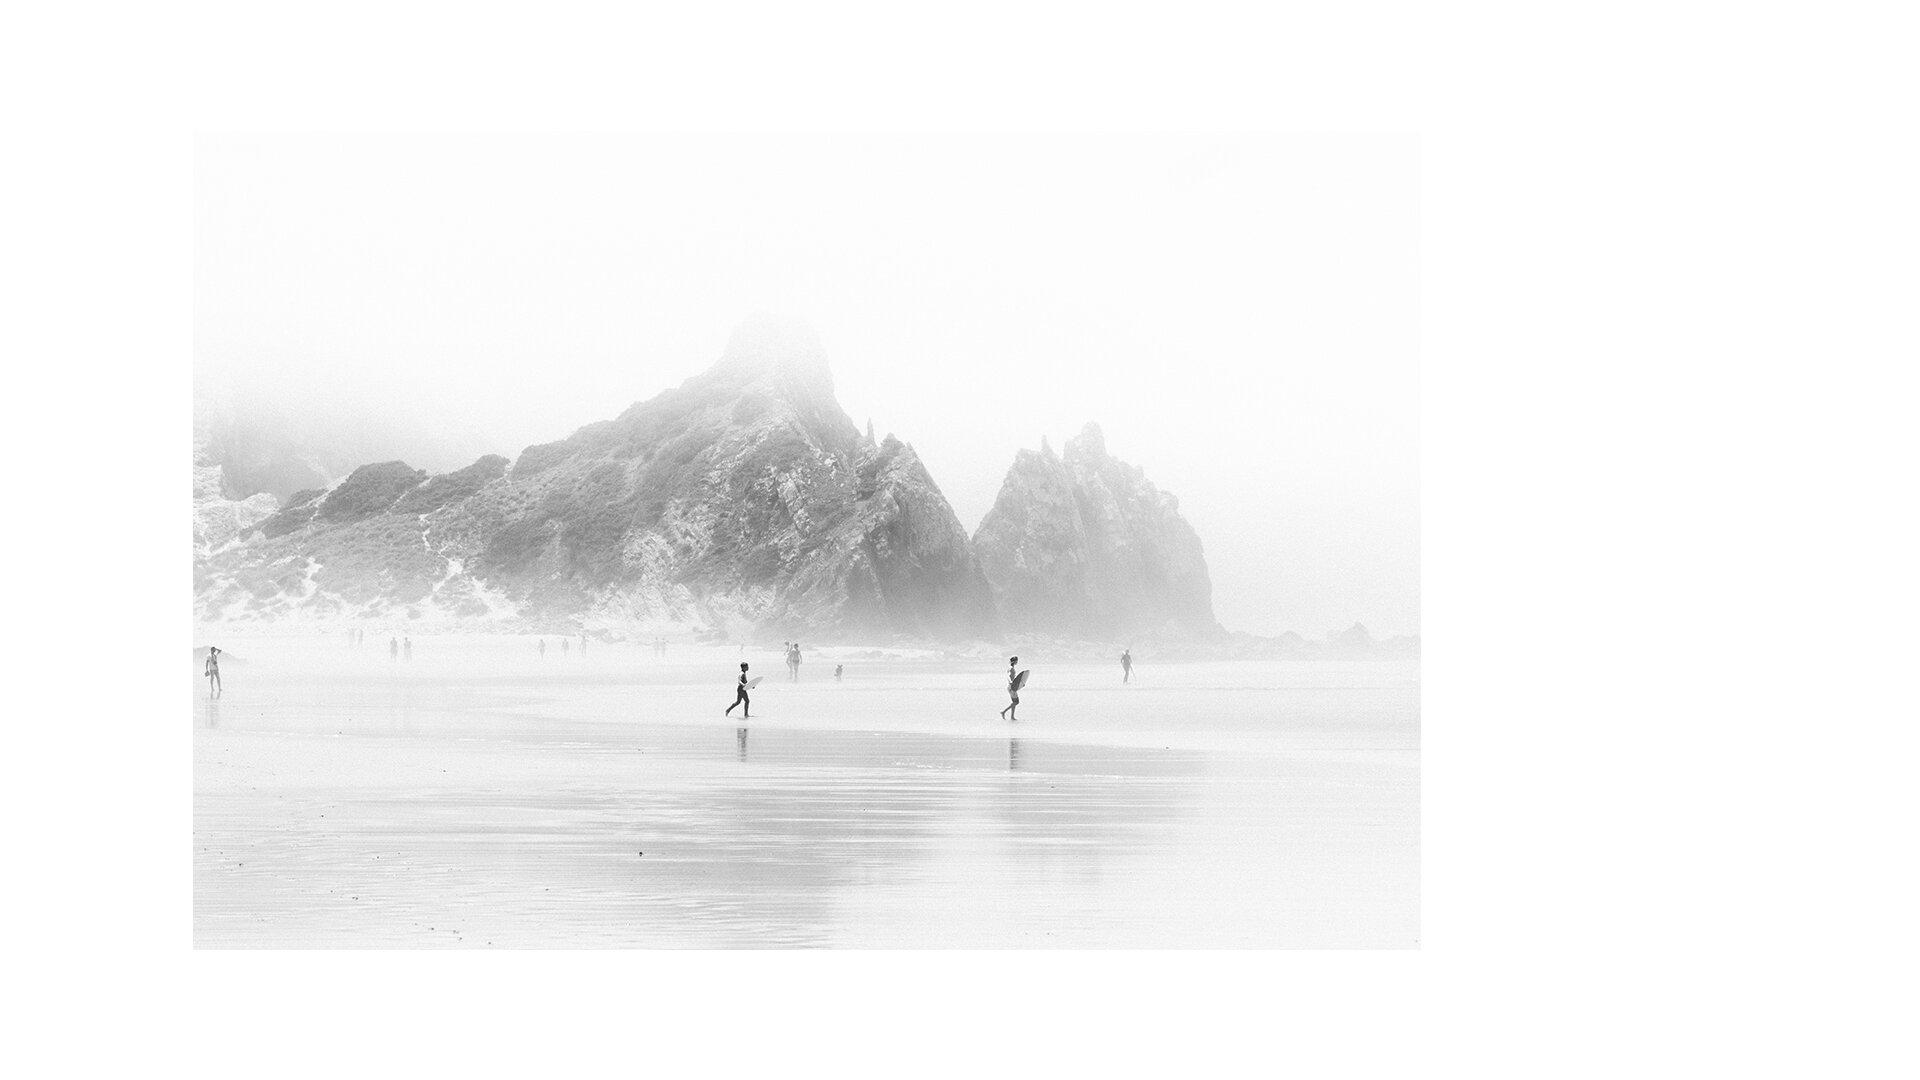 toby-butler-tobybutlerphoto-surf-surfing-waterphotography-ocean-Oneill-wetsuits-swimwear-girl-bikini-clothing-surf-portugal-lifestylephotography-6.jpg